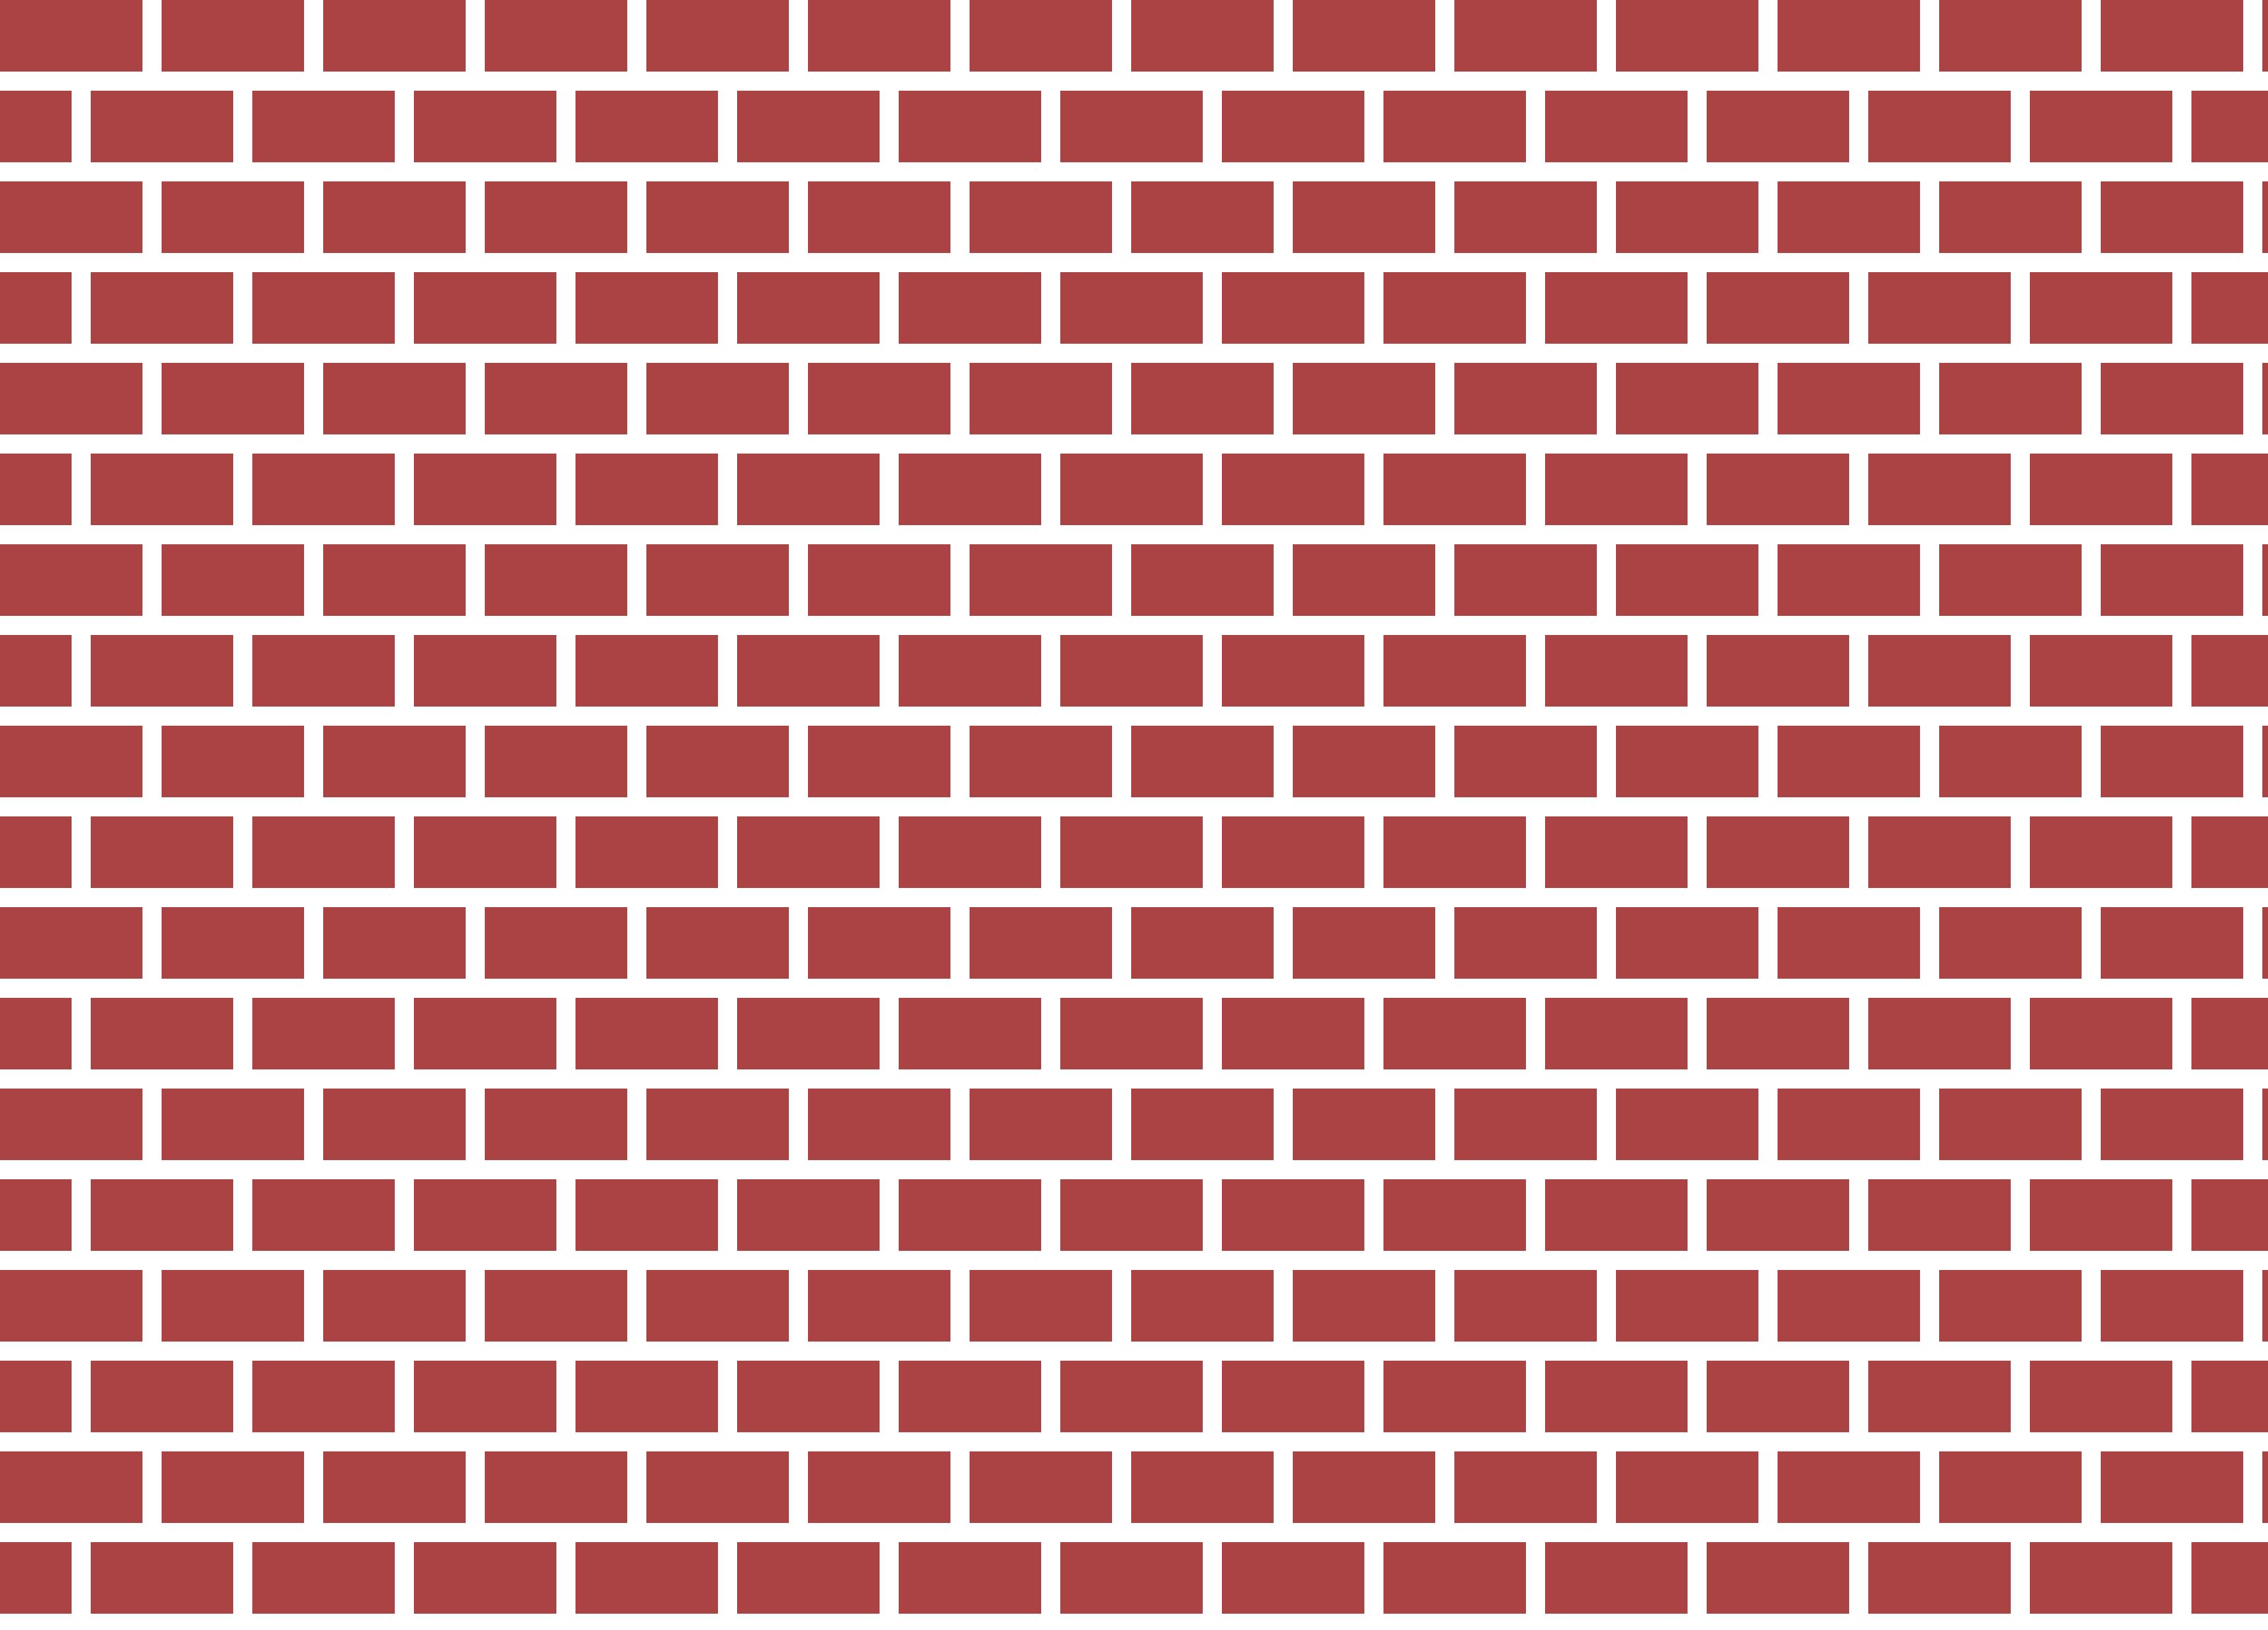 Brick clipart #7, Download drawings